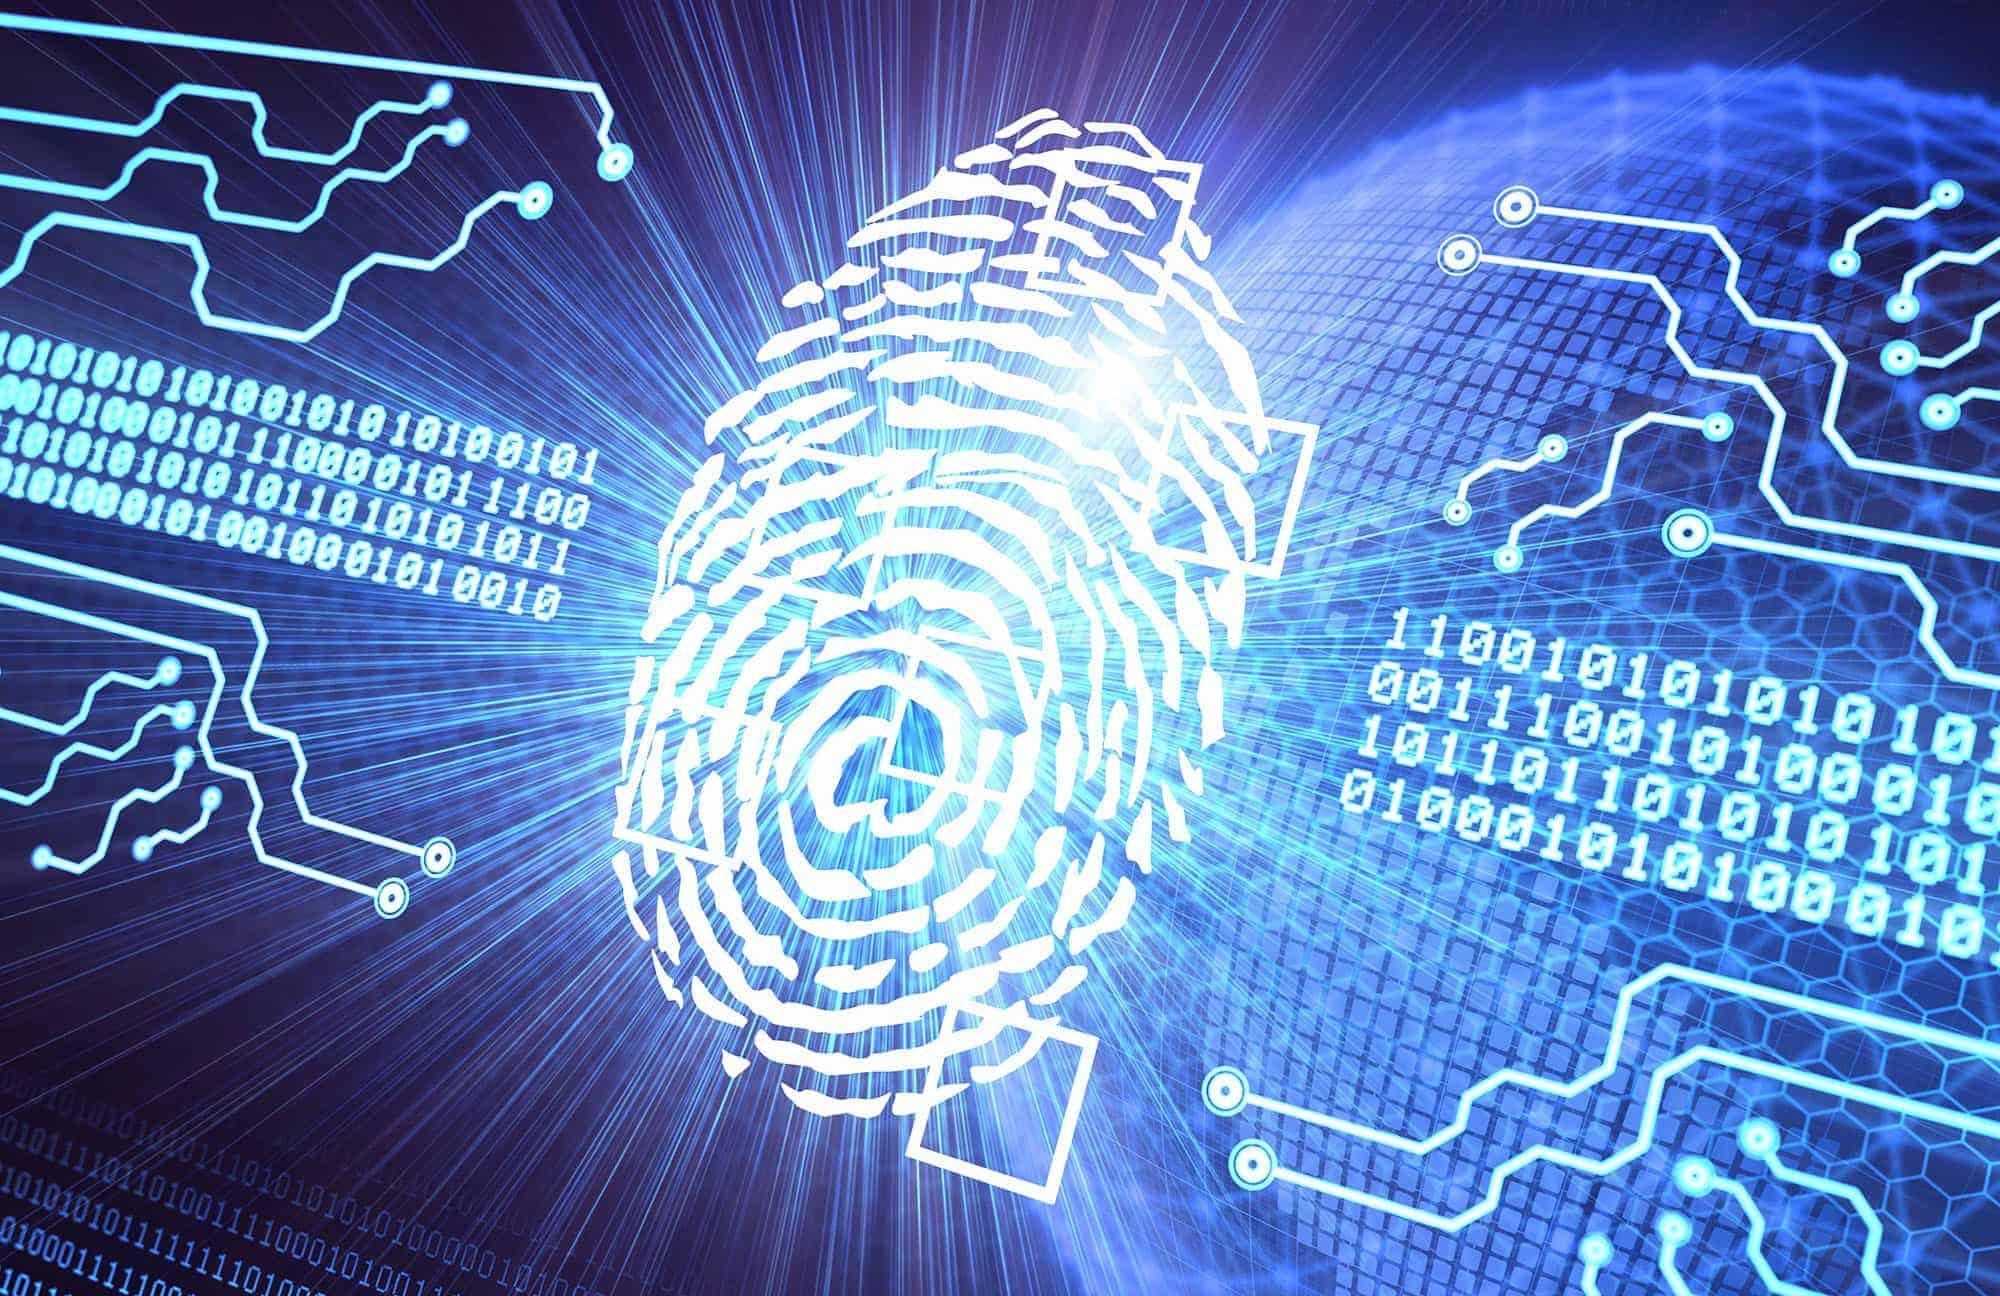 Digital Identity